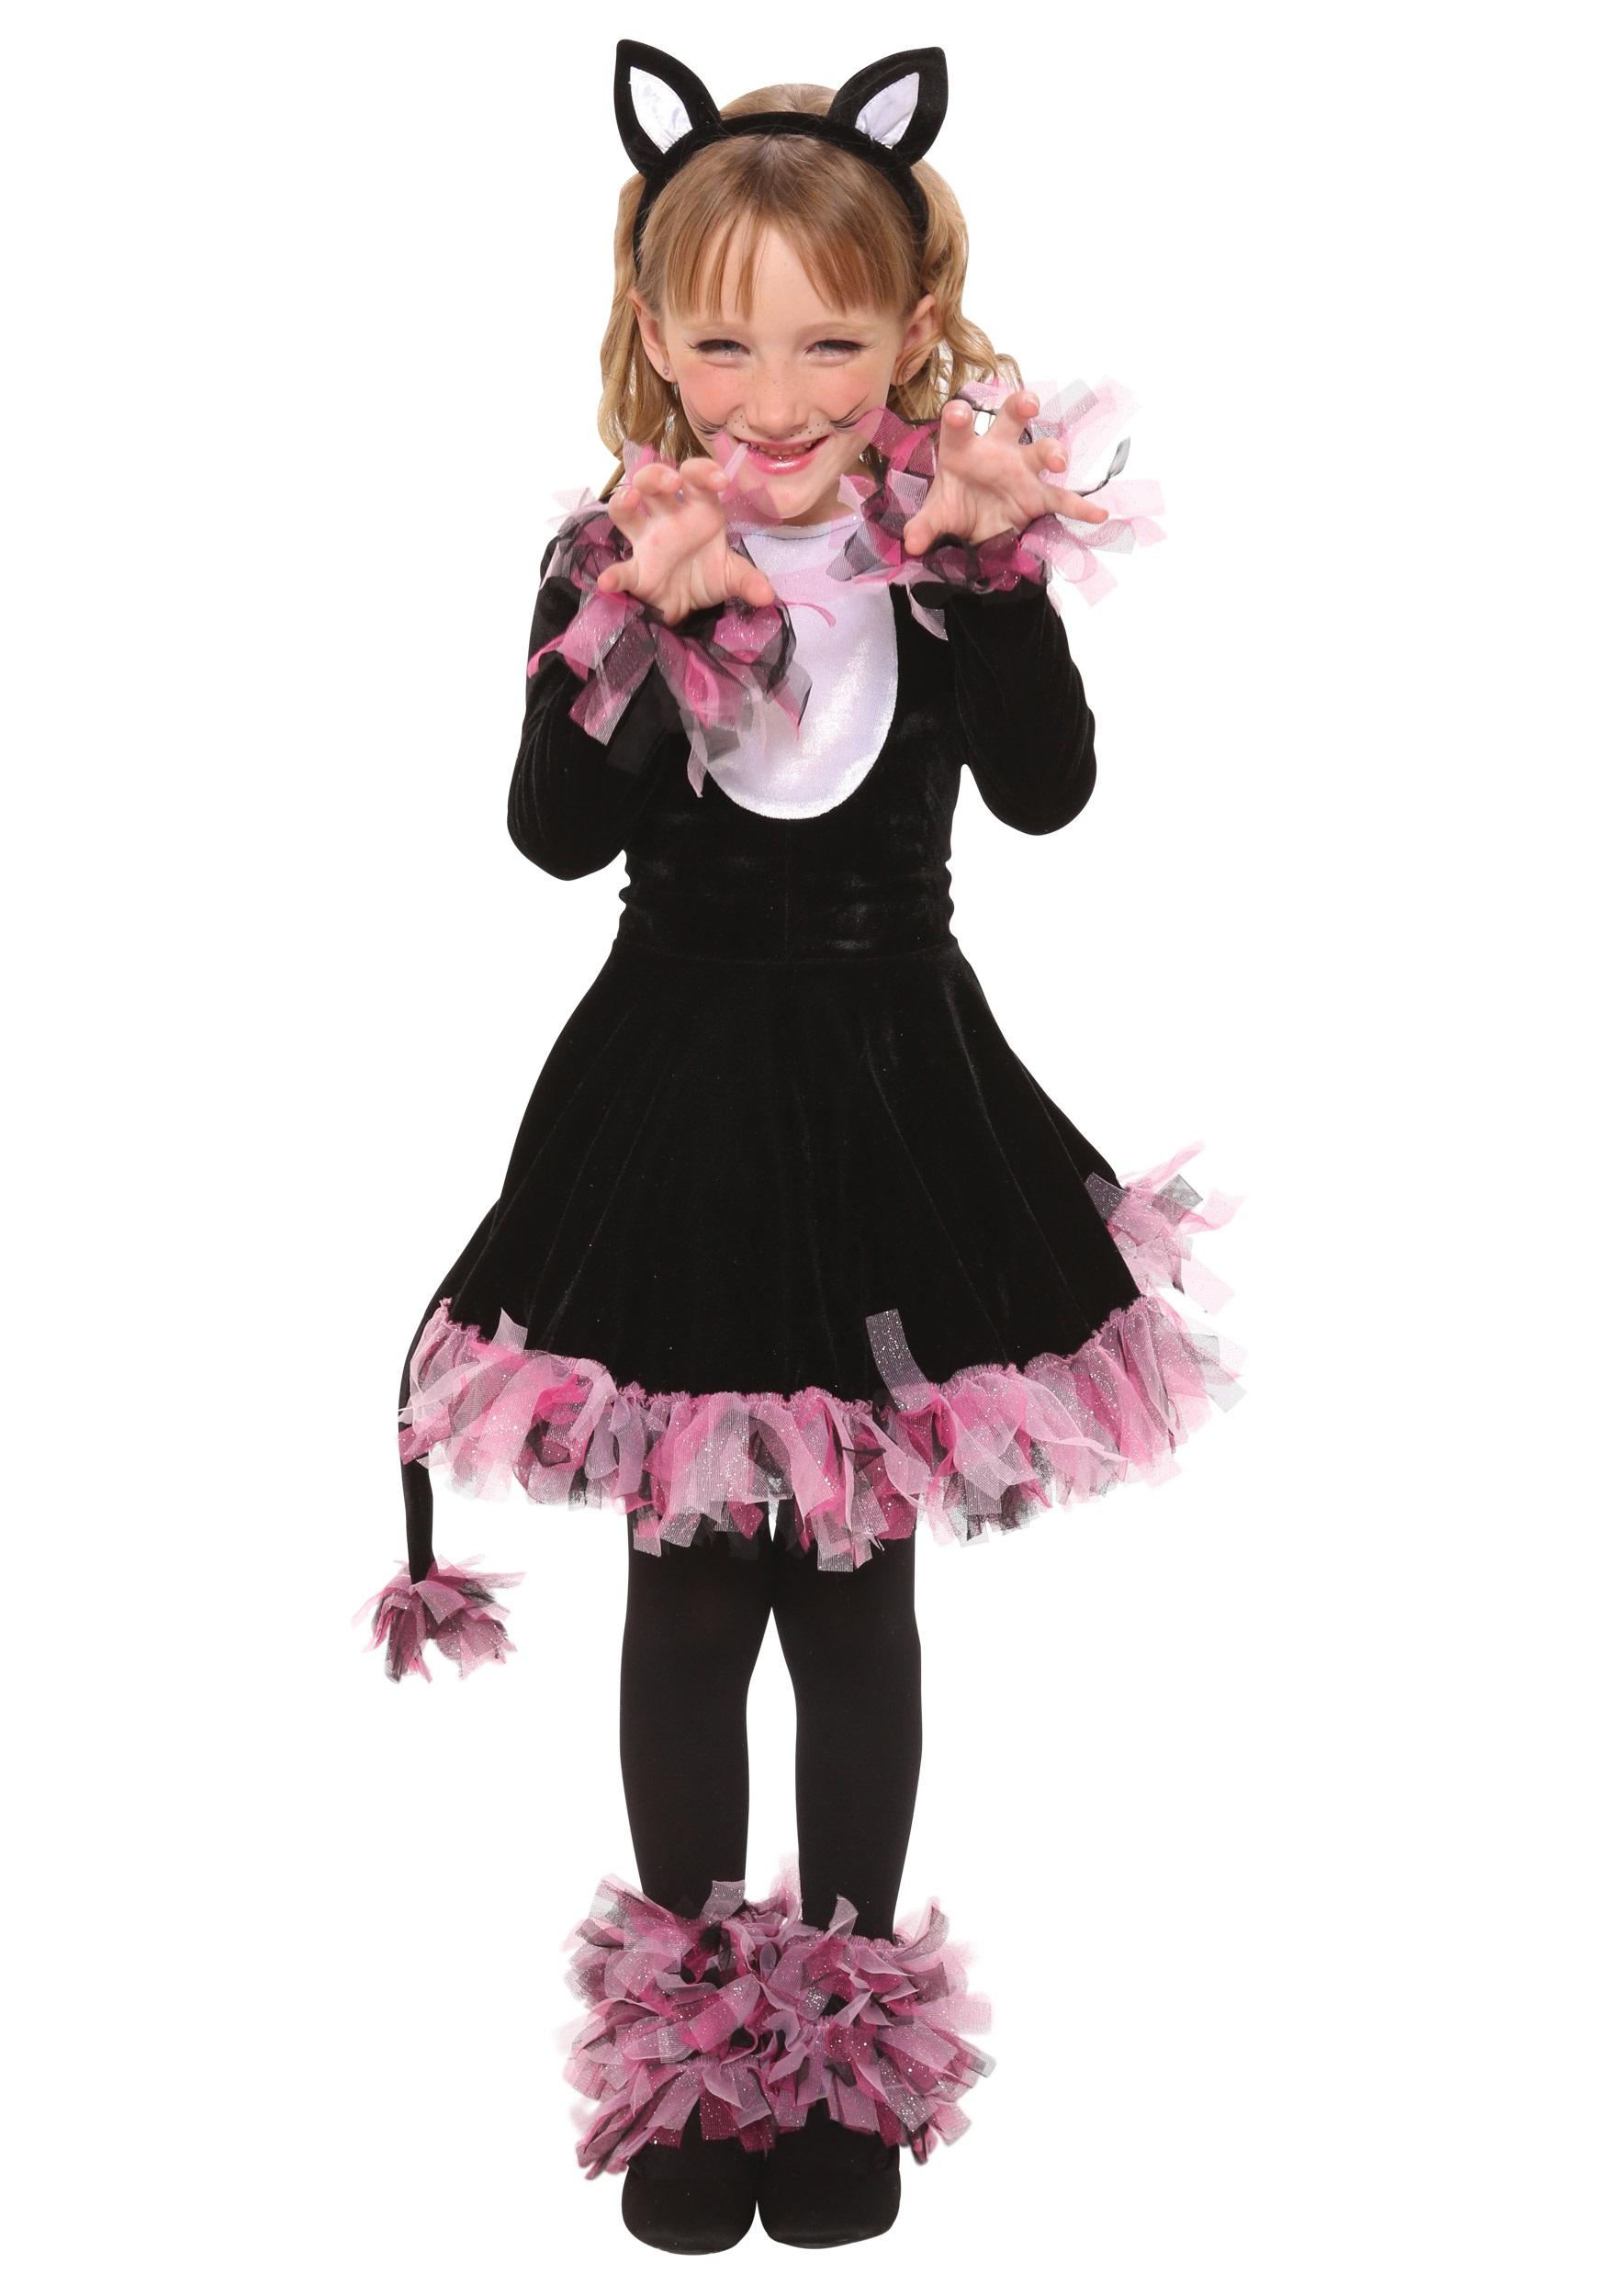 Girls Black Cat Costume  sc 1 st  Halloween Costumes & Girls Black Cat Costume - Halloween Costumes